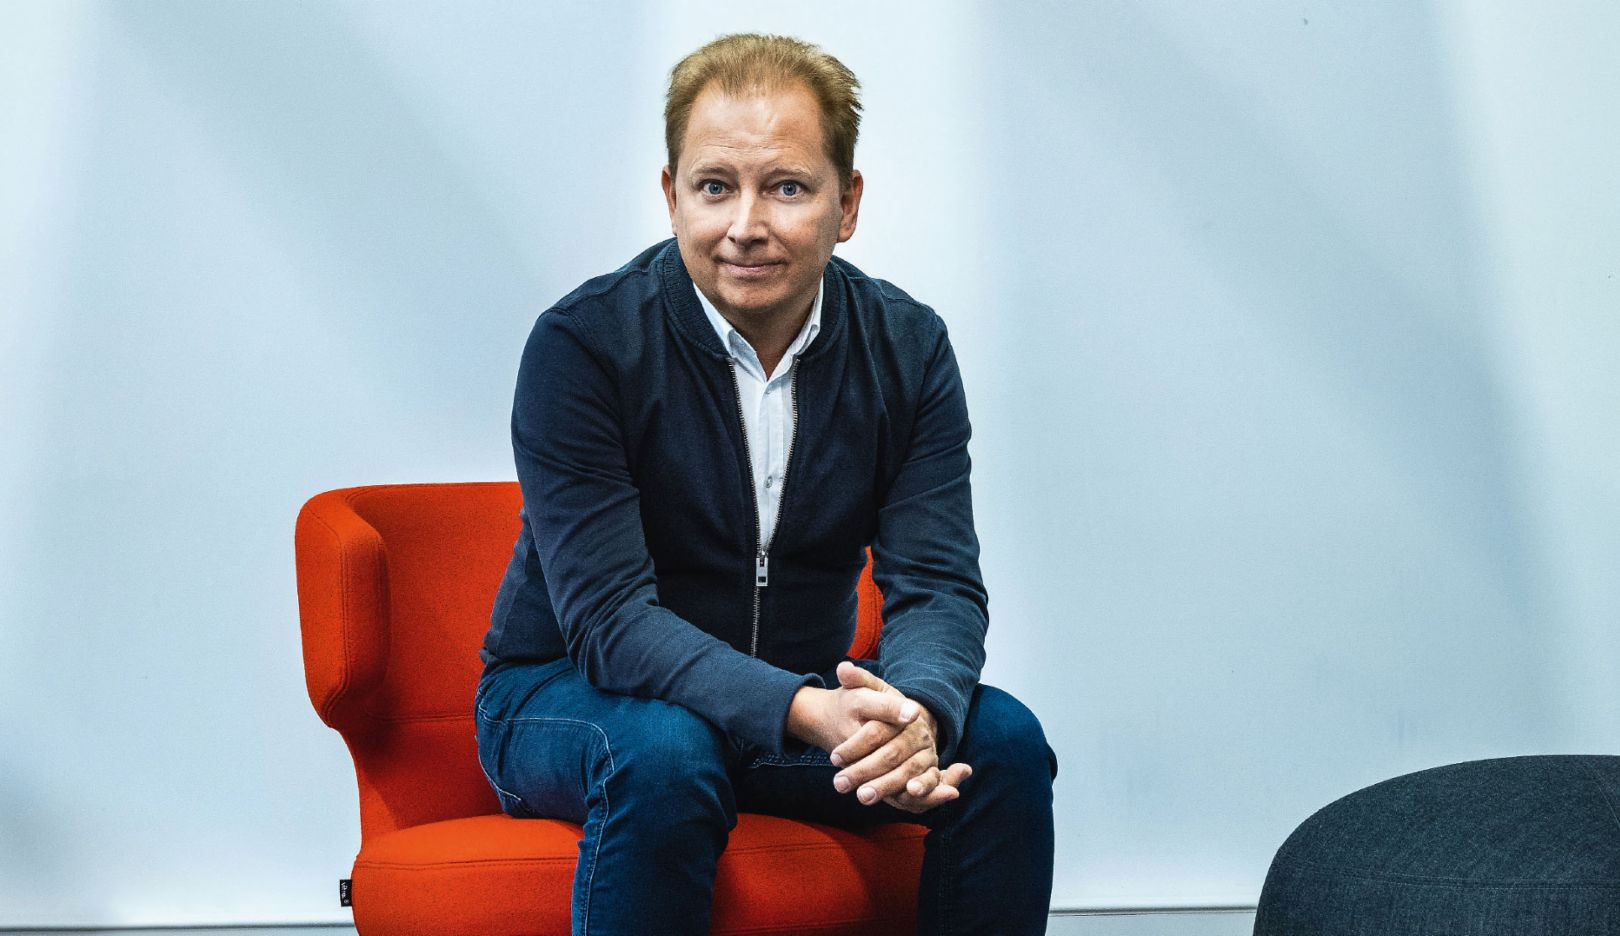 Тило Козловски, глава Porsche Digital GmbH, 2019, Porsche AG